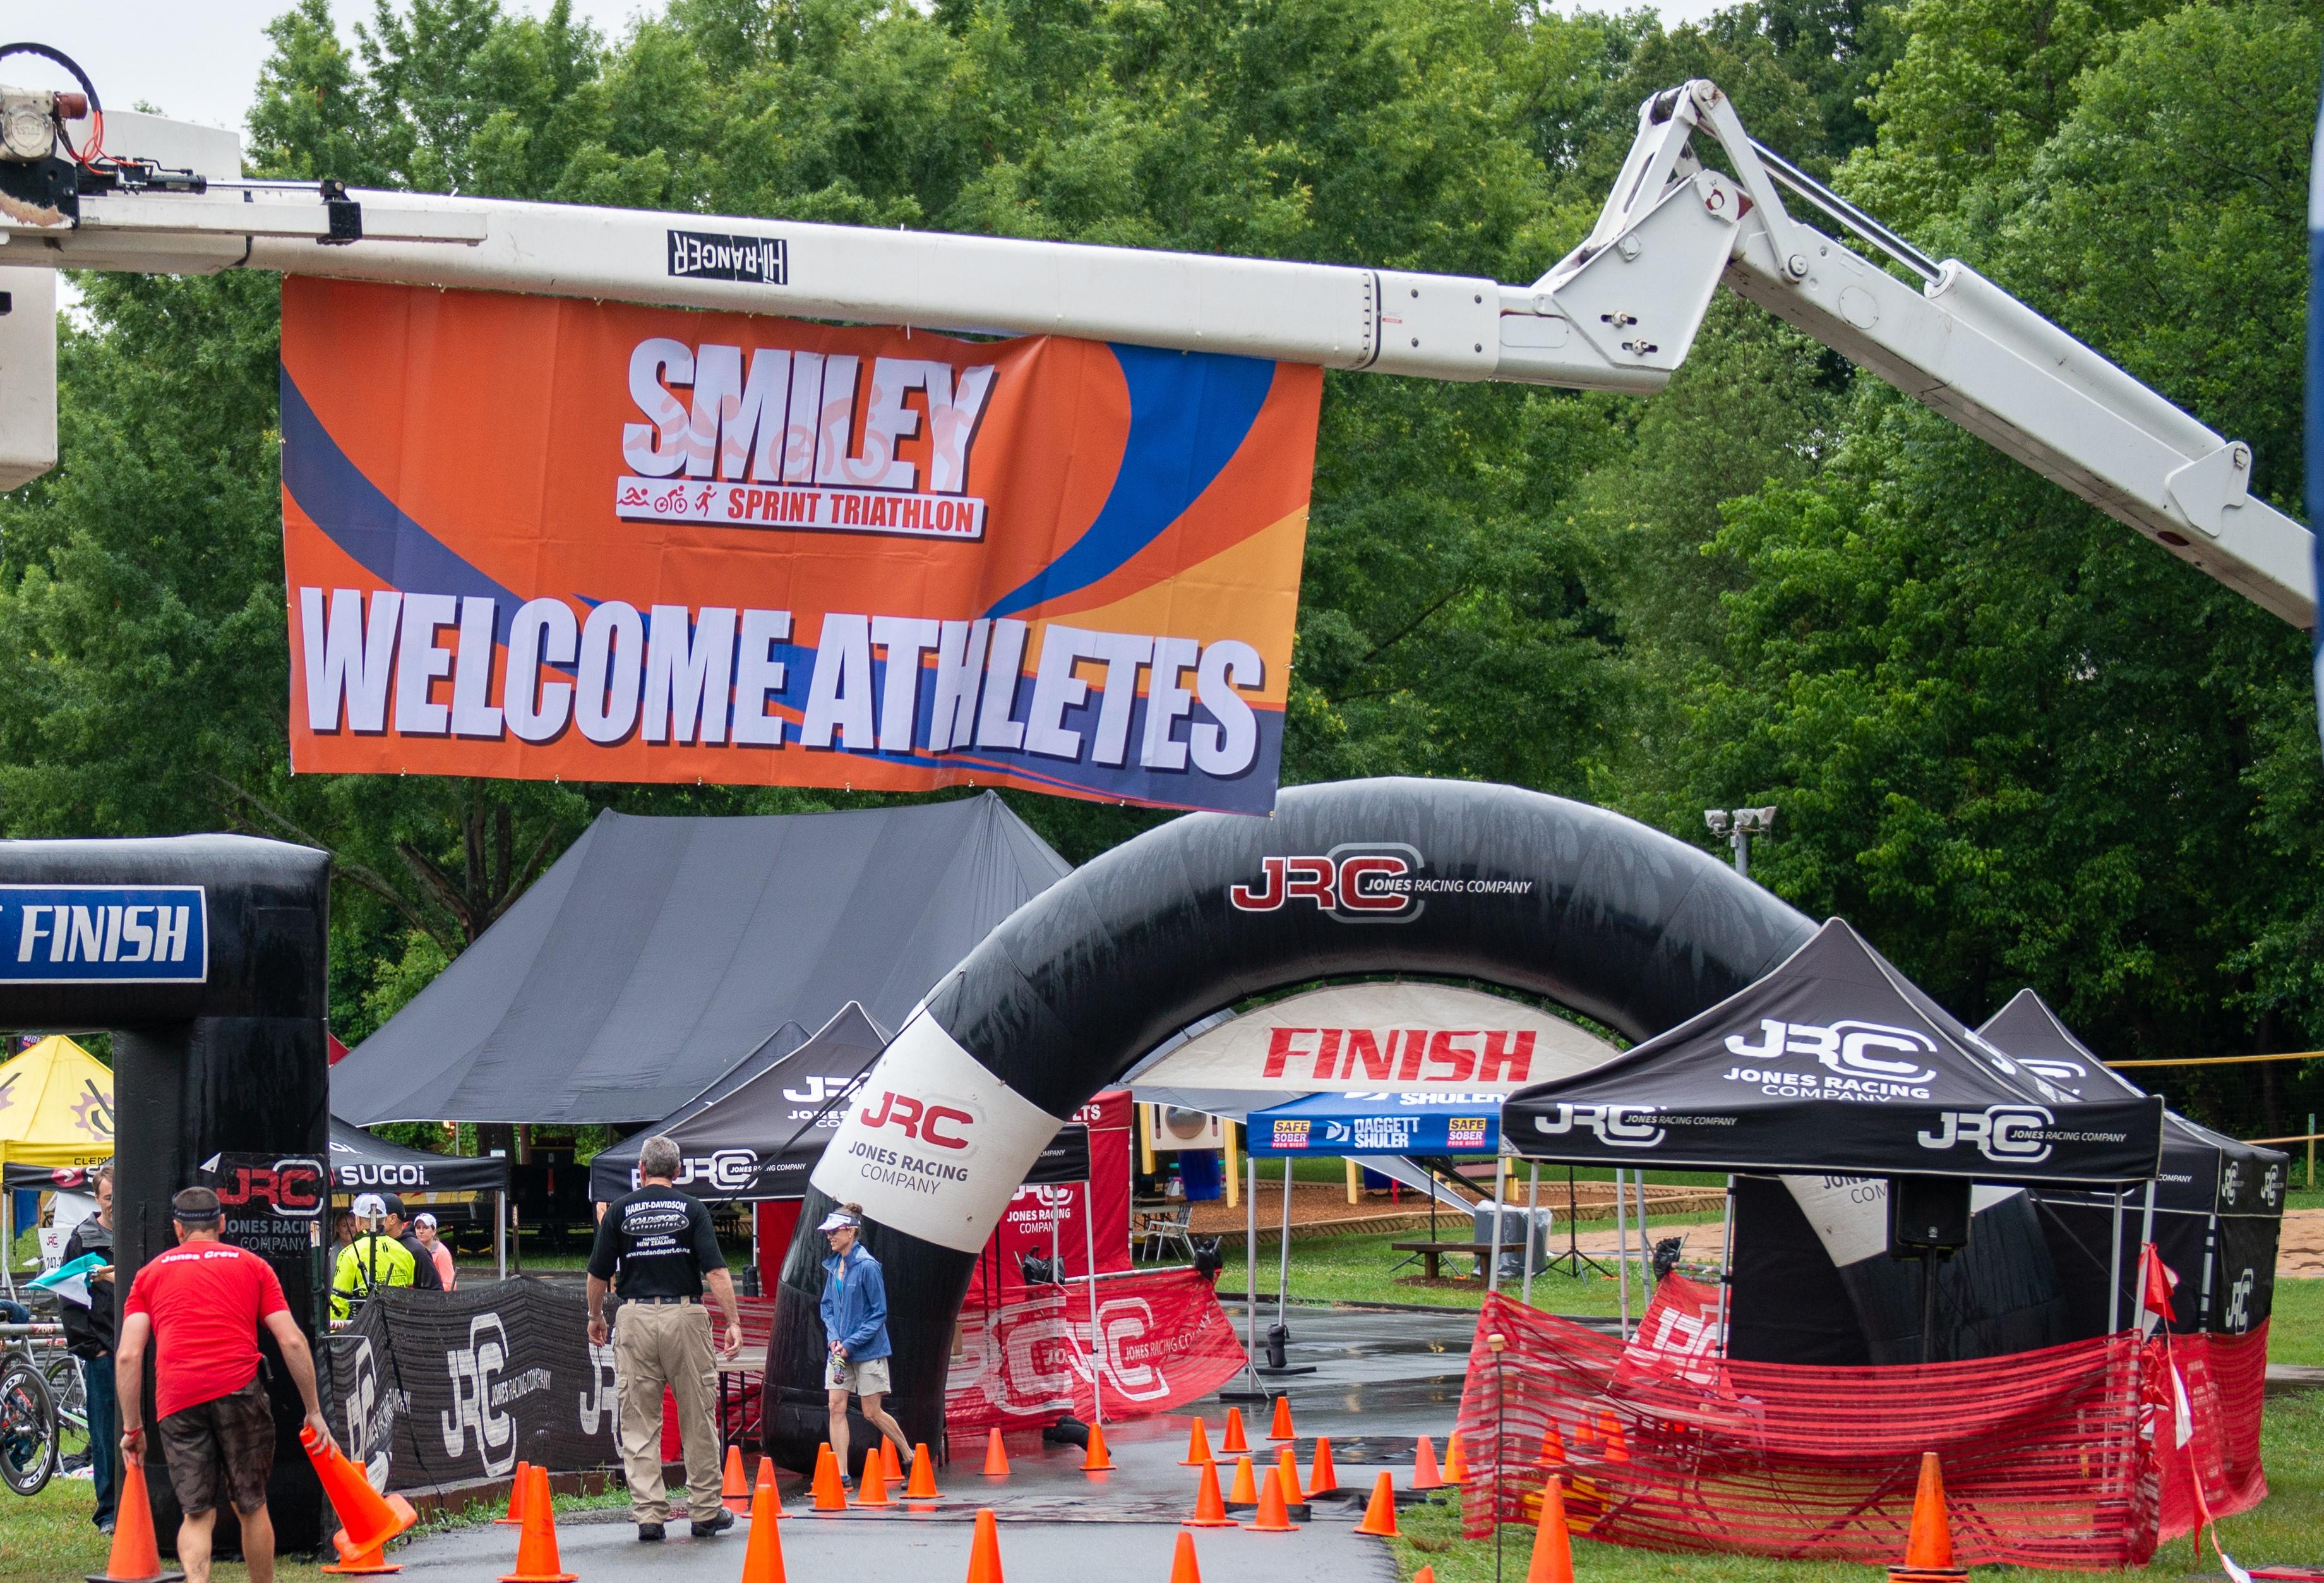 Smiley Sprint Triathlon